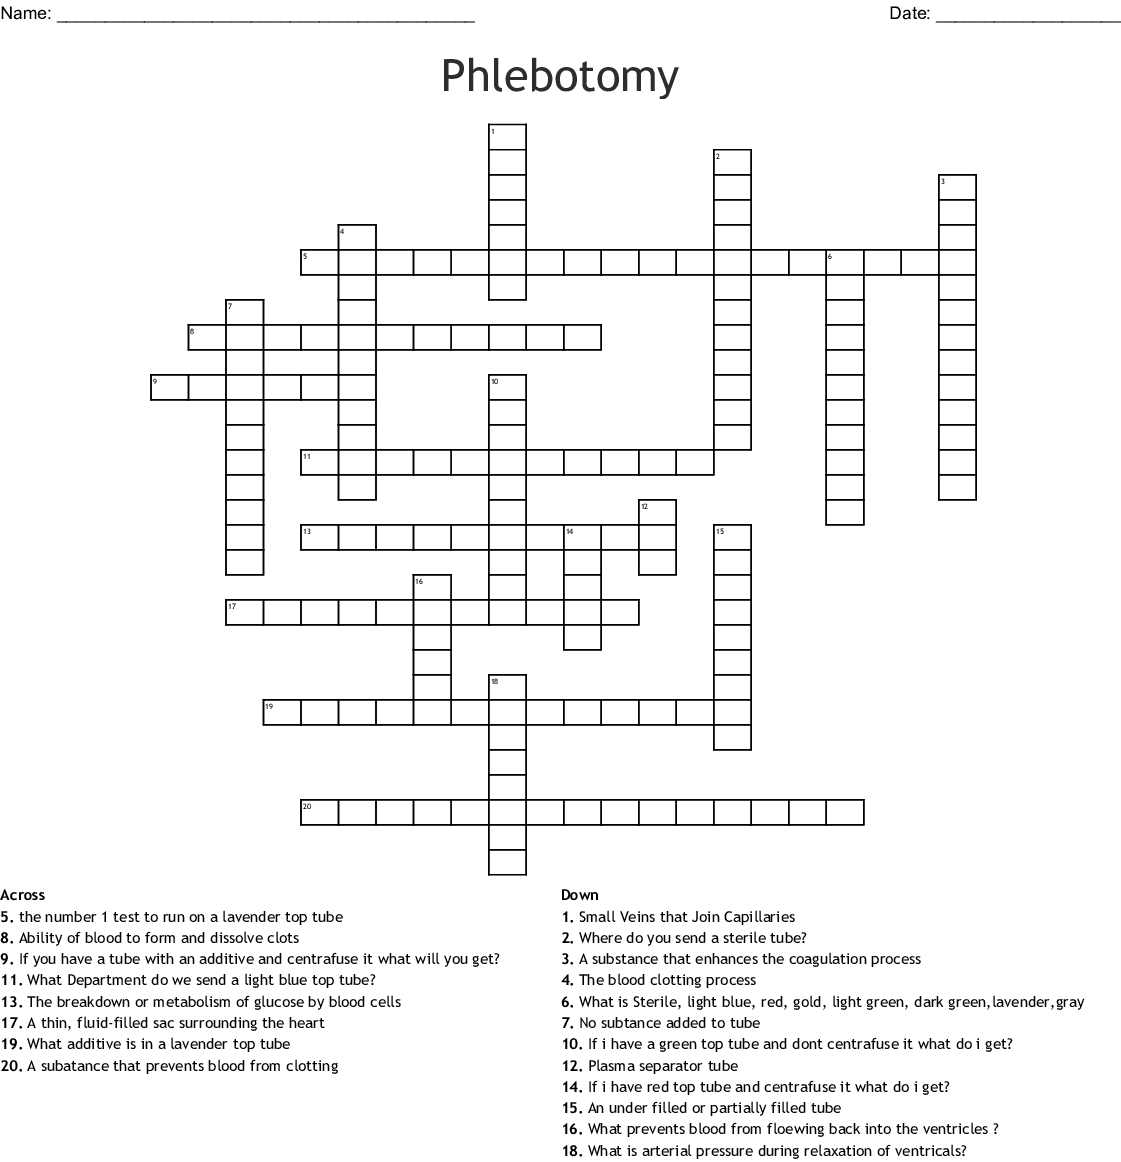 Phlebotomy Crossword